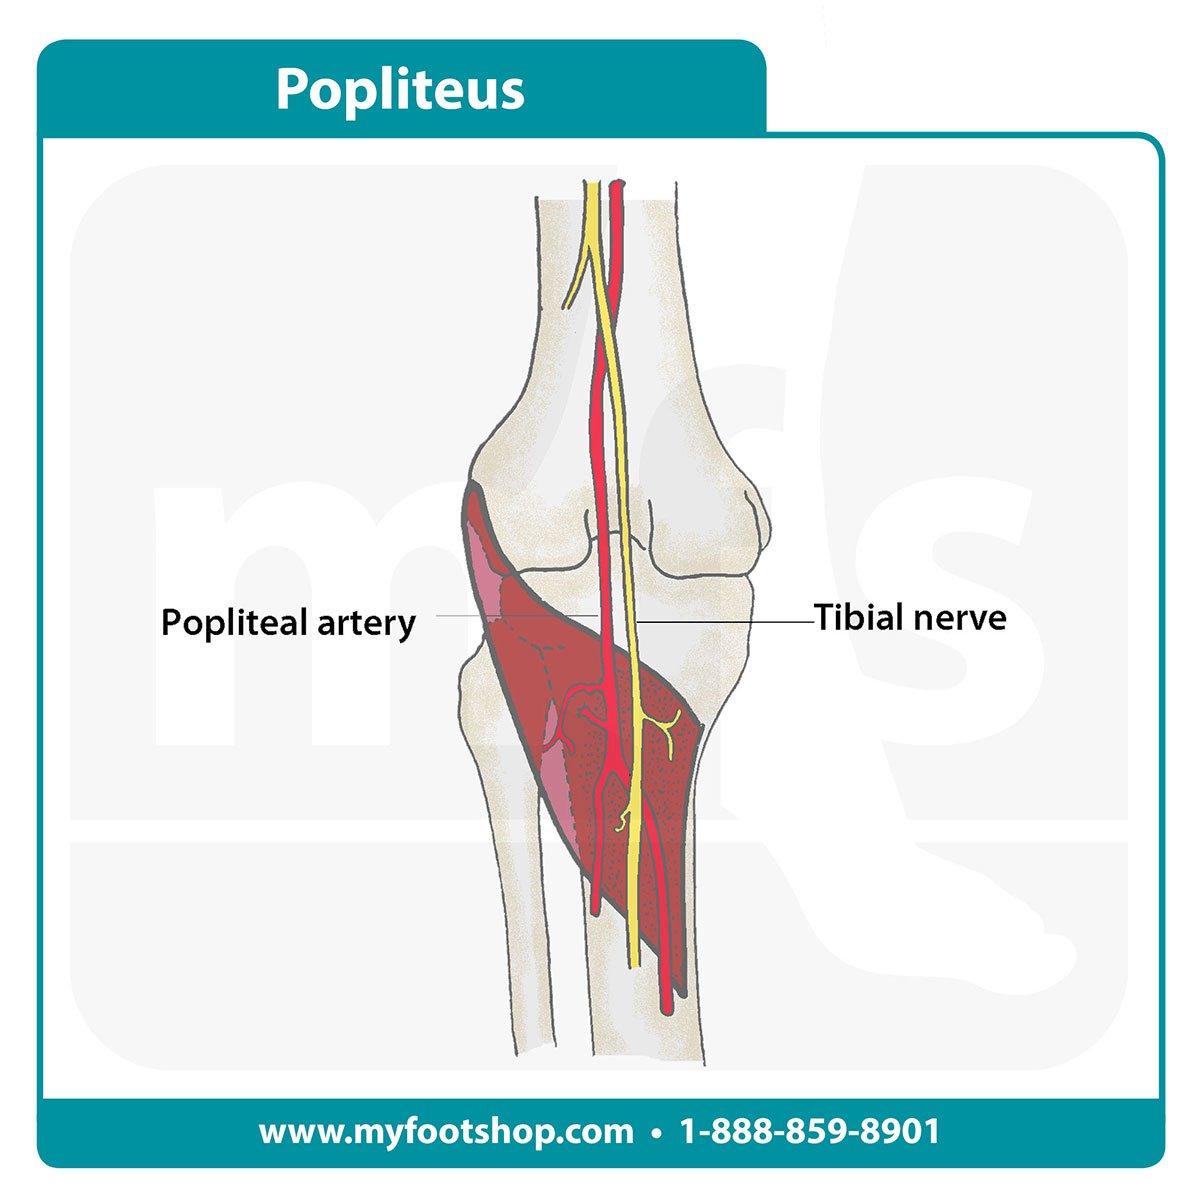 Popliteus muscle